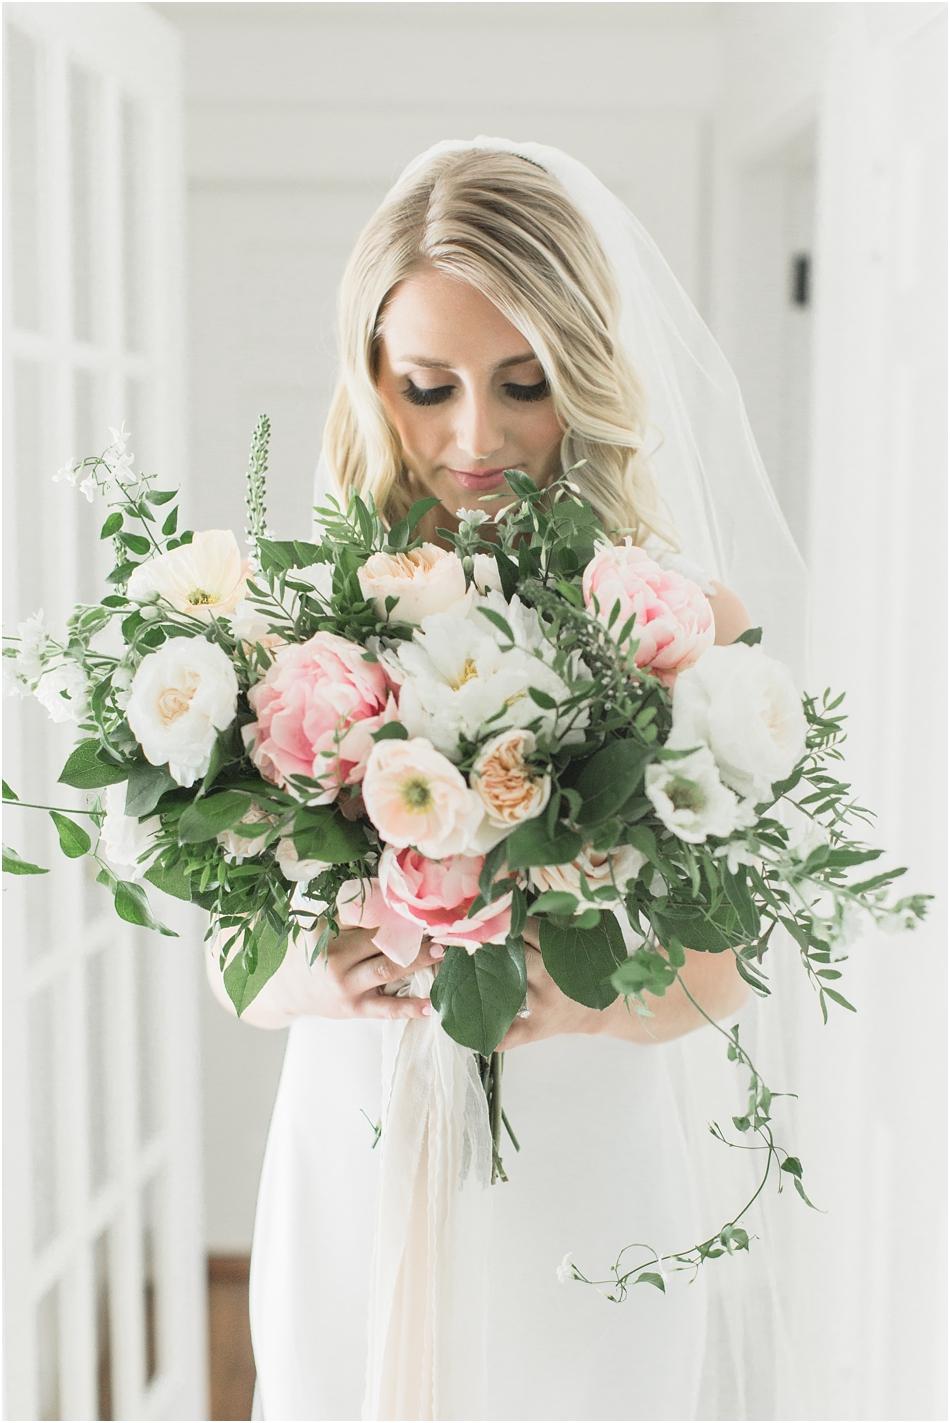 brunch_style_me_pretty_dennis_inn__always_yours_events_wild_dahlia_massachusetts_cape_cod_new_england_wedding_photographer_Meredith_Jane_Photography_photo_2106.jpg